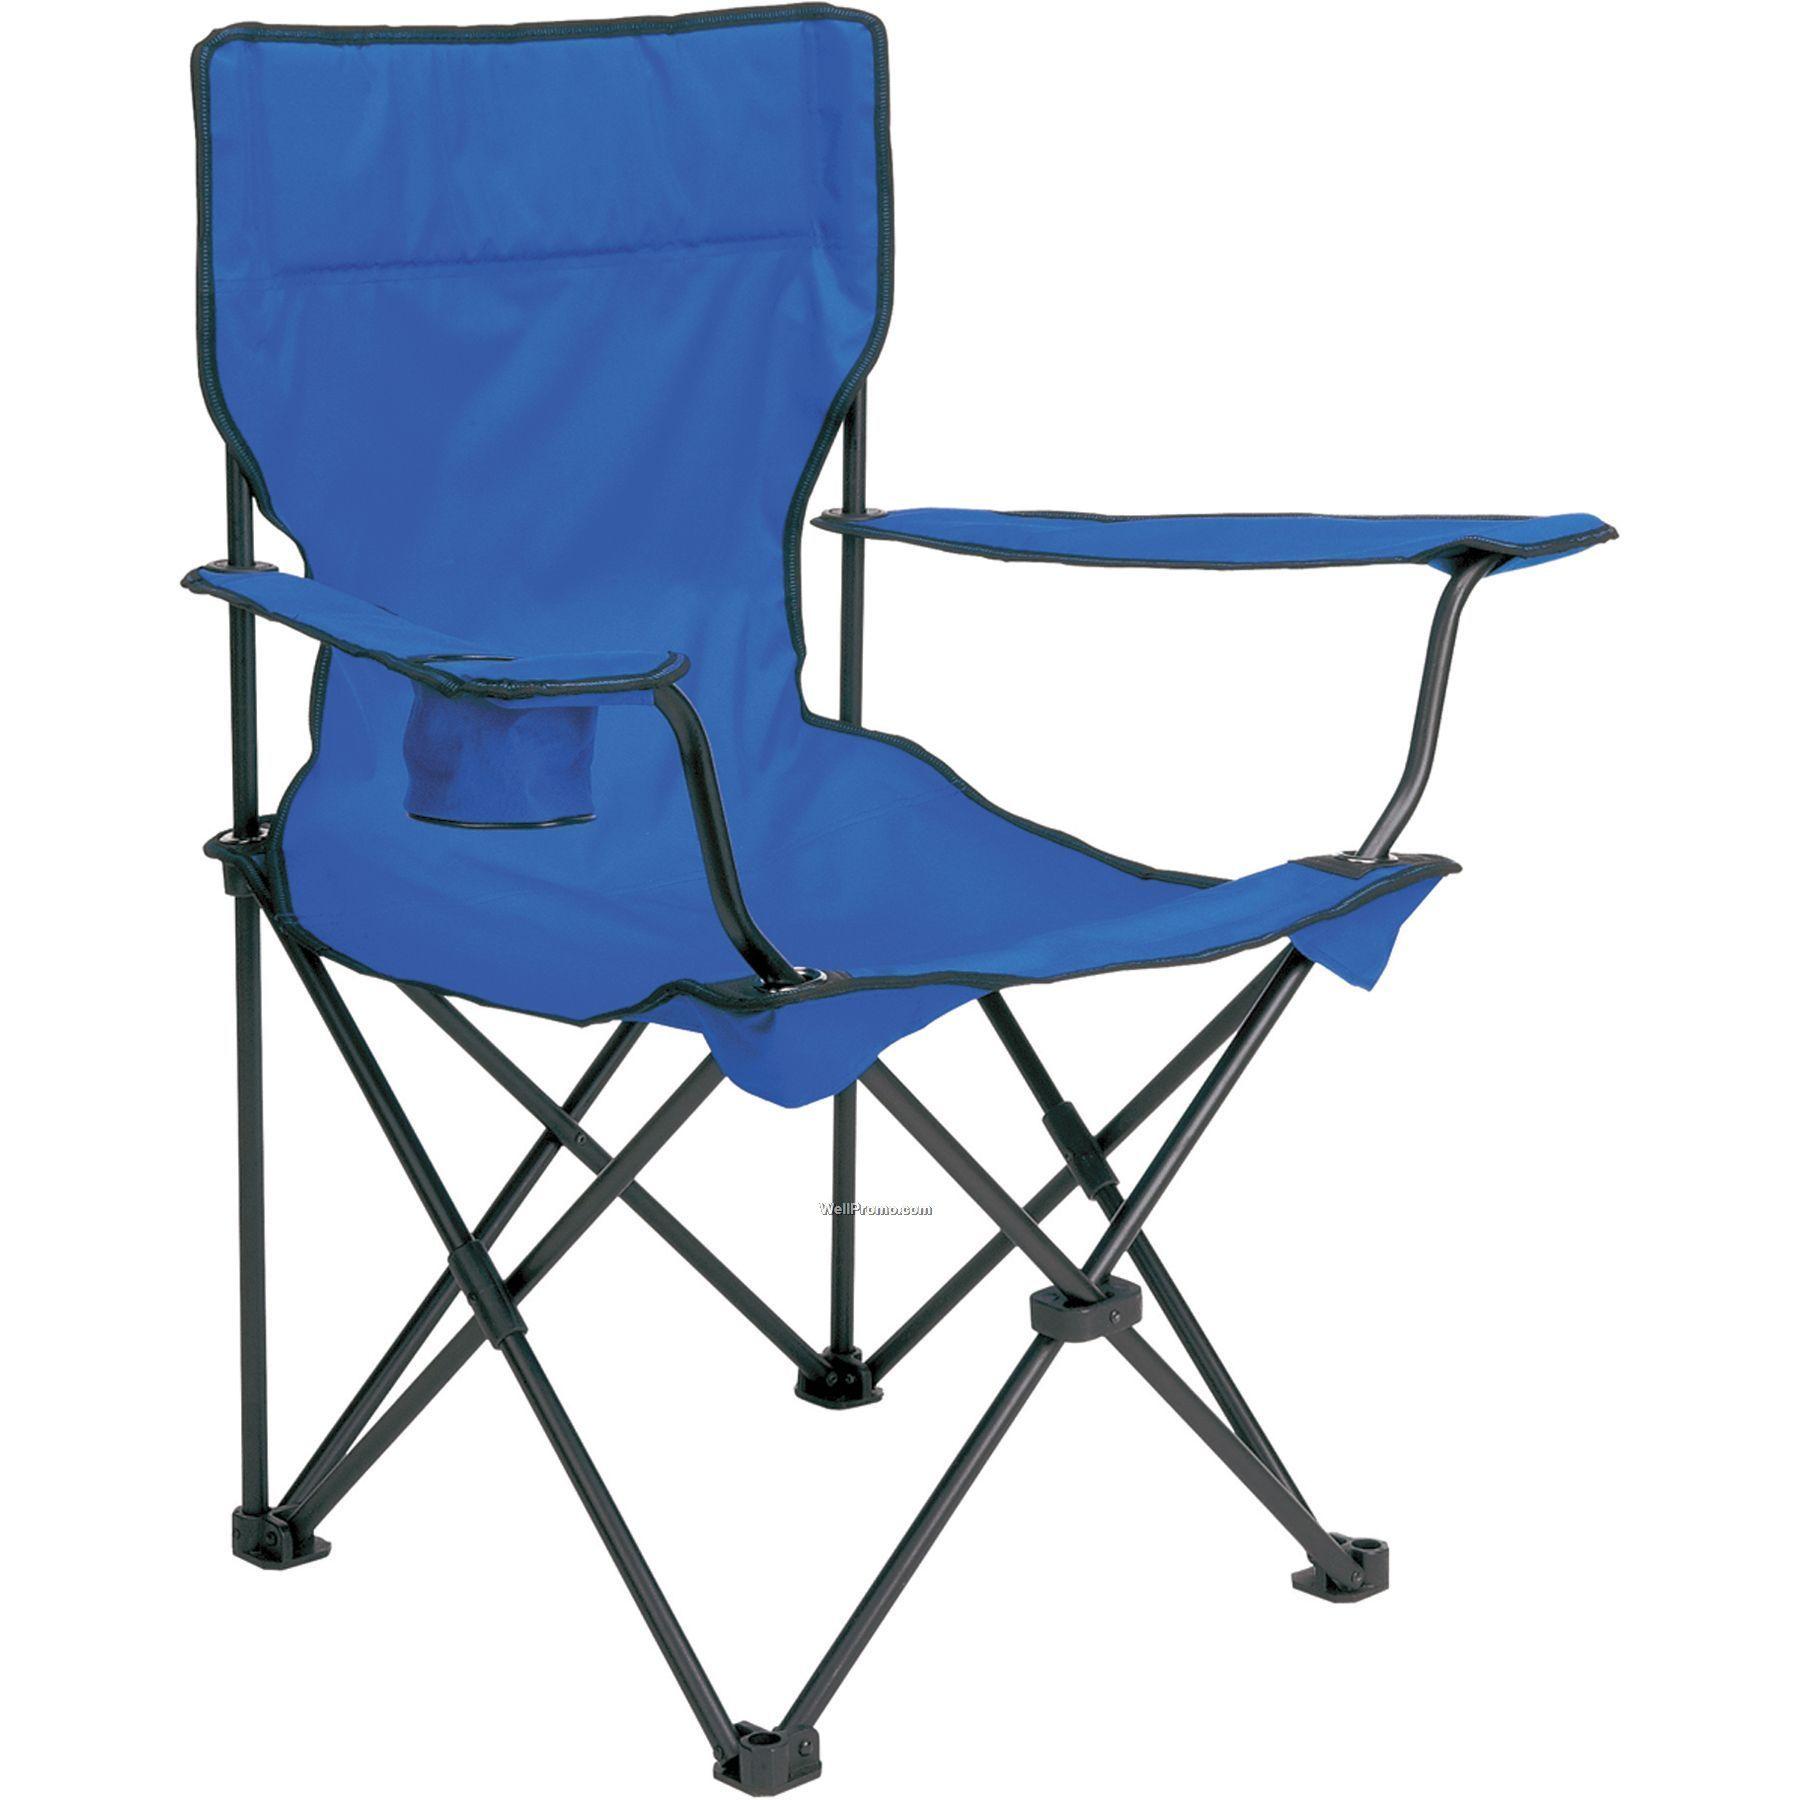 lawn-folding-chairs-elegant-rectangle-modern-metal-lawn-chair -ideas-fabulous-design-folding-of-lawn-folding-chairs